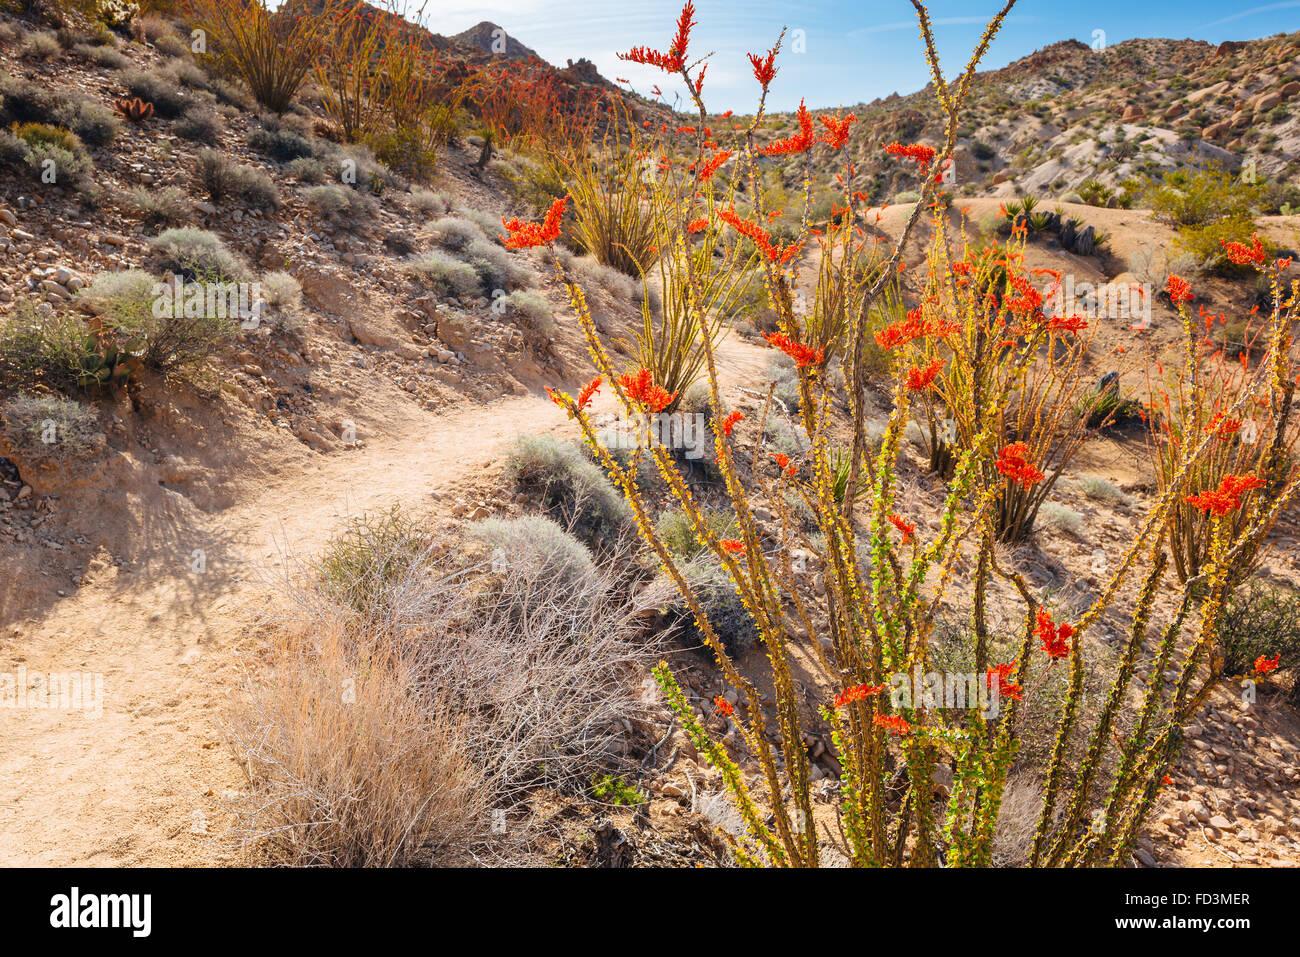 Die verlorenen Palms Canyon Wanderweg in Joshua Tree Nationalpark, Kalifornien Stockbild